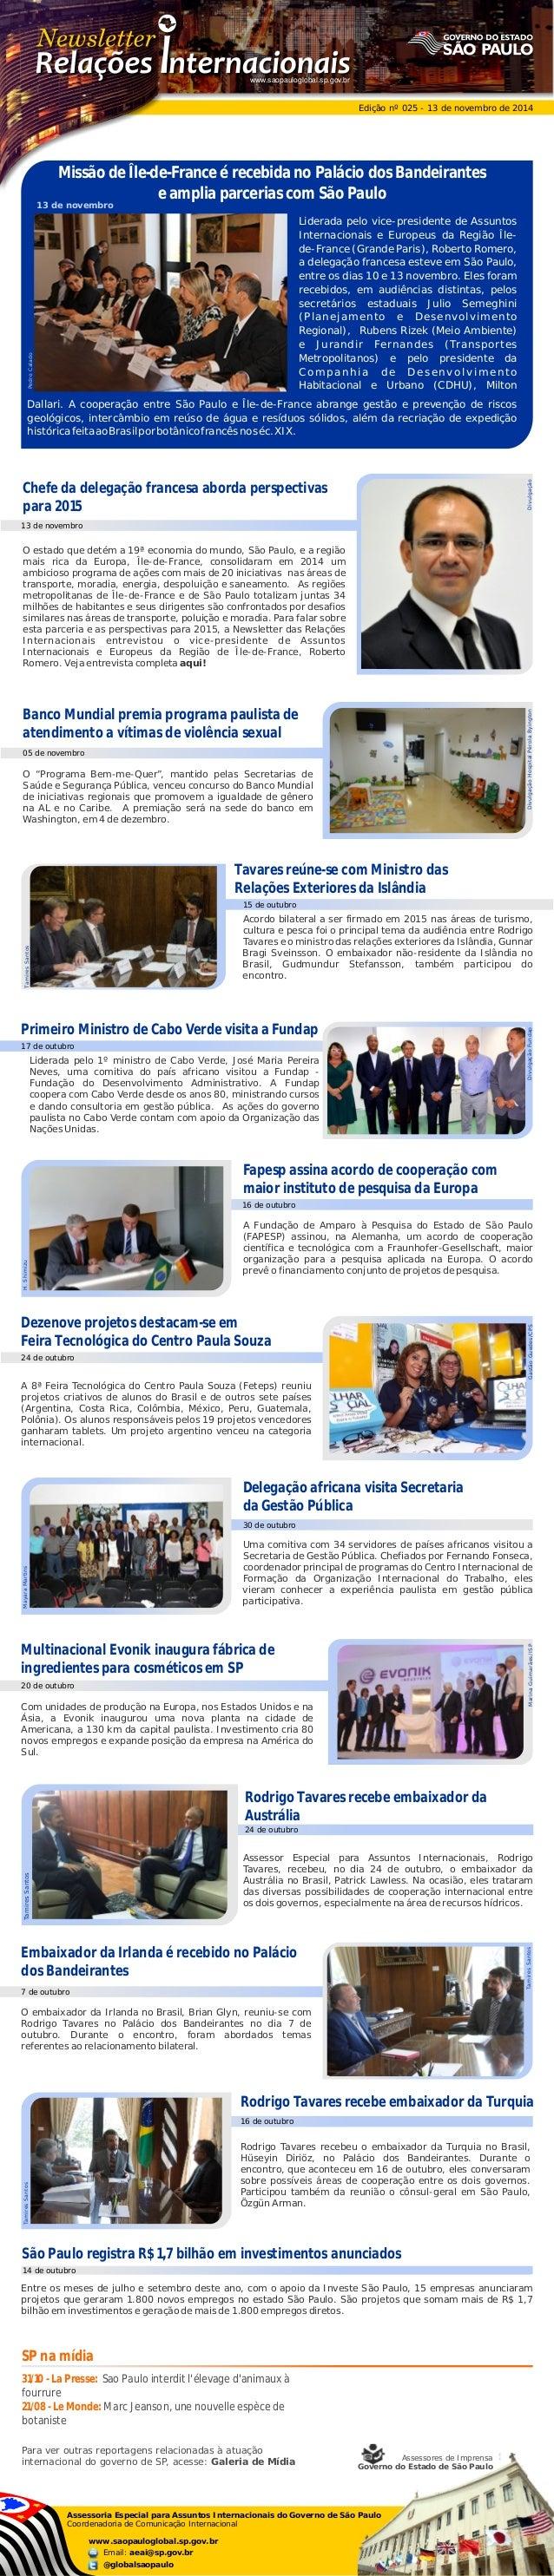 36 news ri-ed25